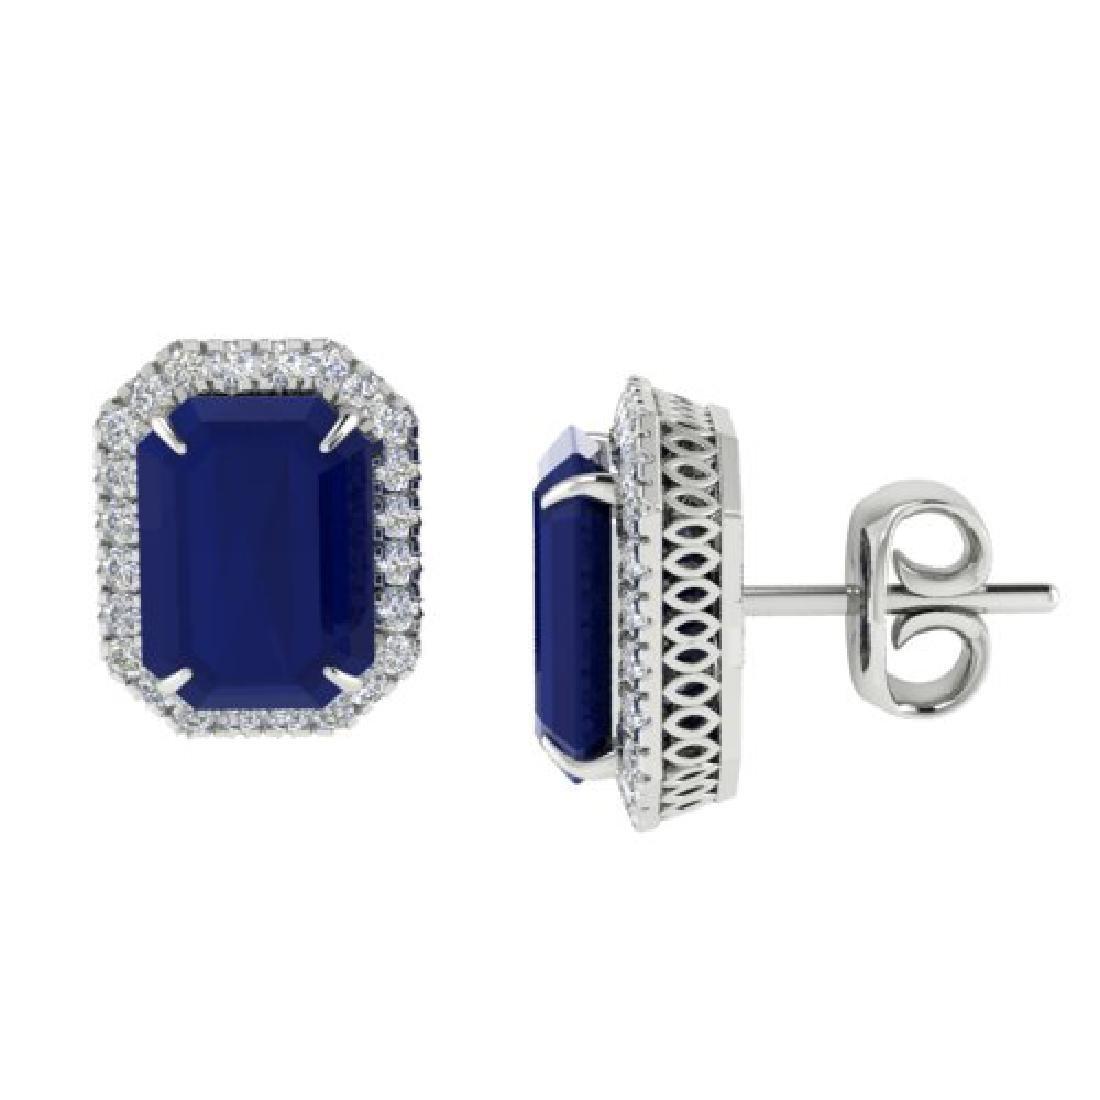 14 CTW Sapphire And Micro Pave VS/SI Diamond Halo - 2